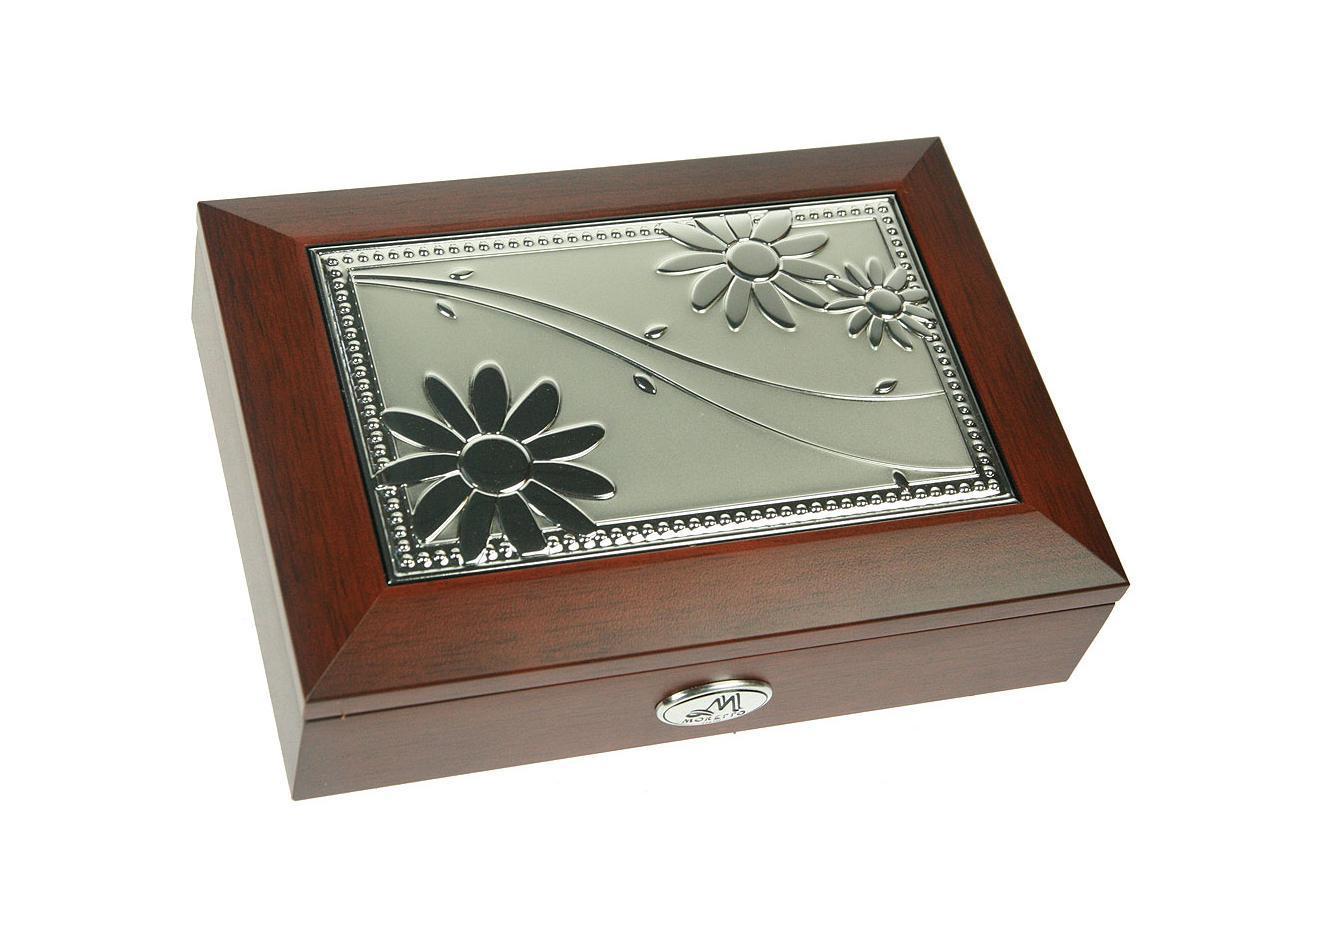 Шкатулка ювелирная Moretto, музыкальная, цвет: коричневый, 18 см х 13 см х 5 см. 139559 шкатулка фоторамка ювелирная moretto 24 х 19 х 5 см 139555